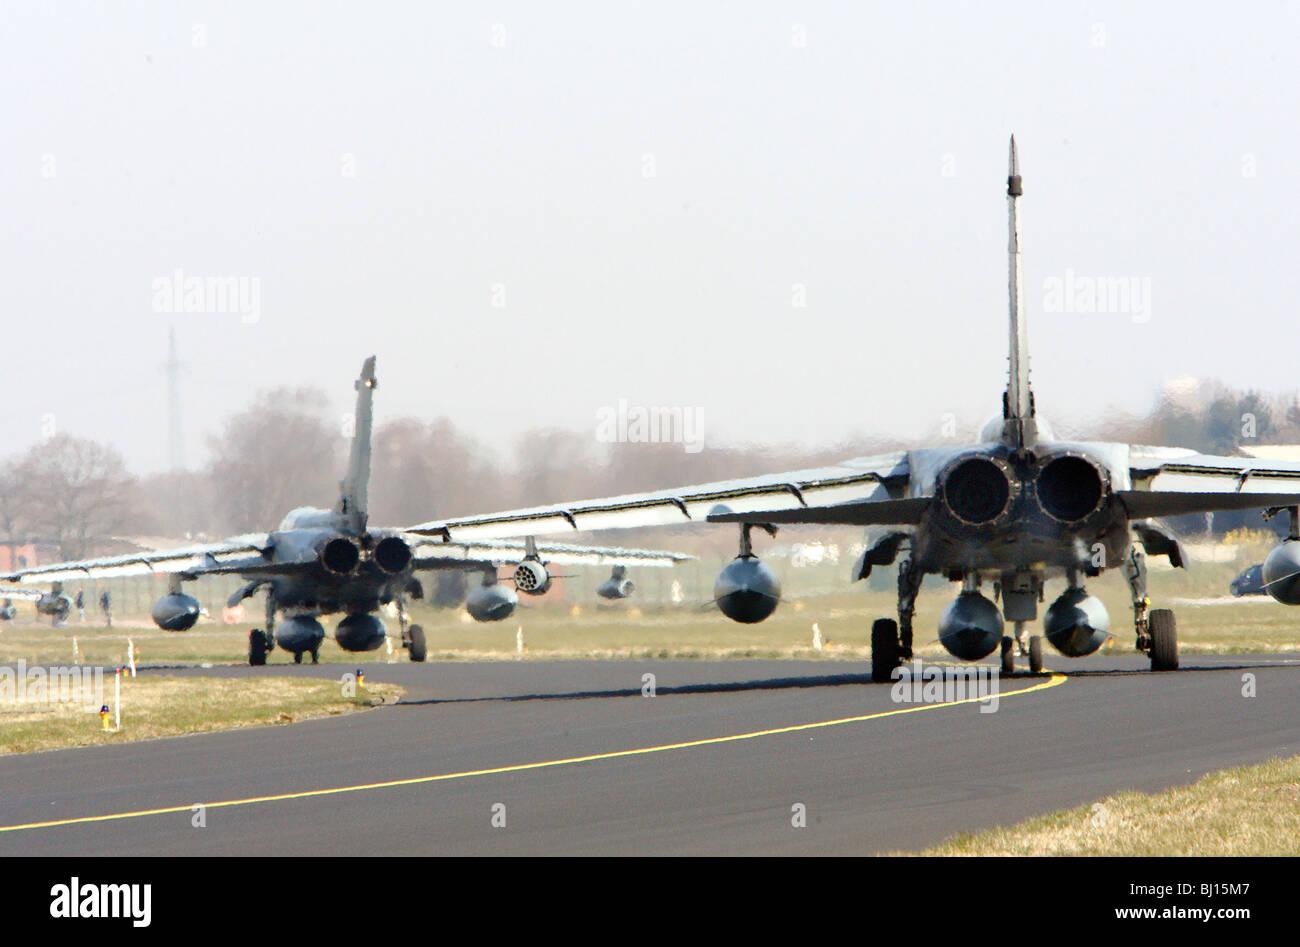 Reconnaissance squadron 51 Immelmann, Jagel, Germany - Stock Image